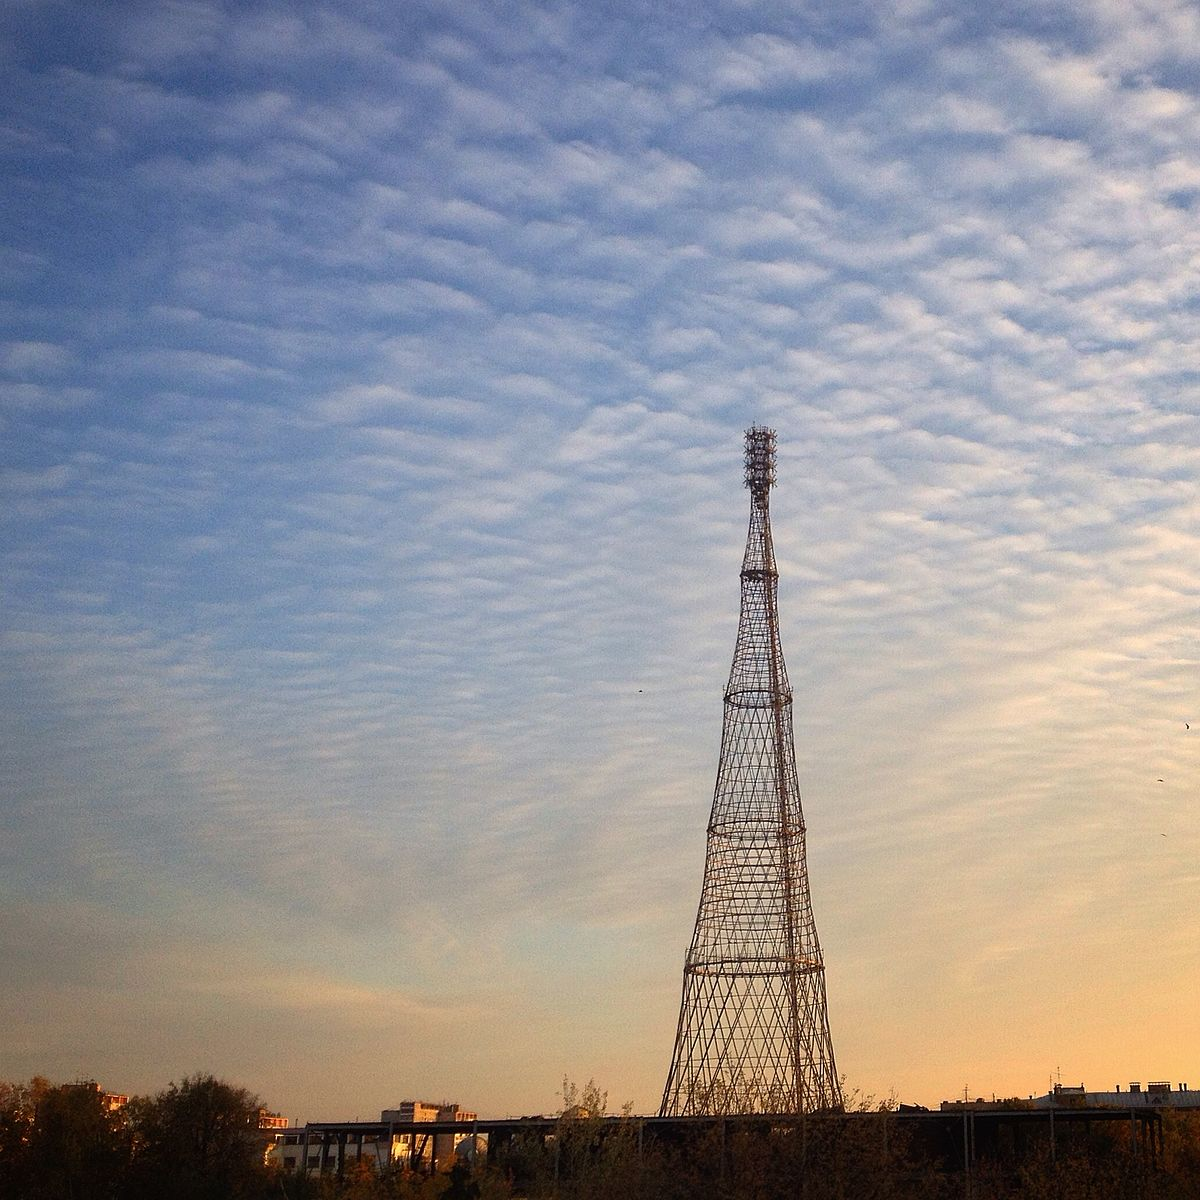 Водонапорная башня с точки зрения физики